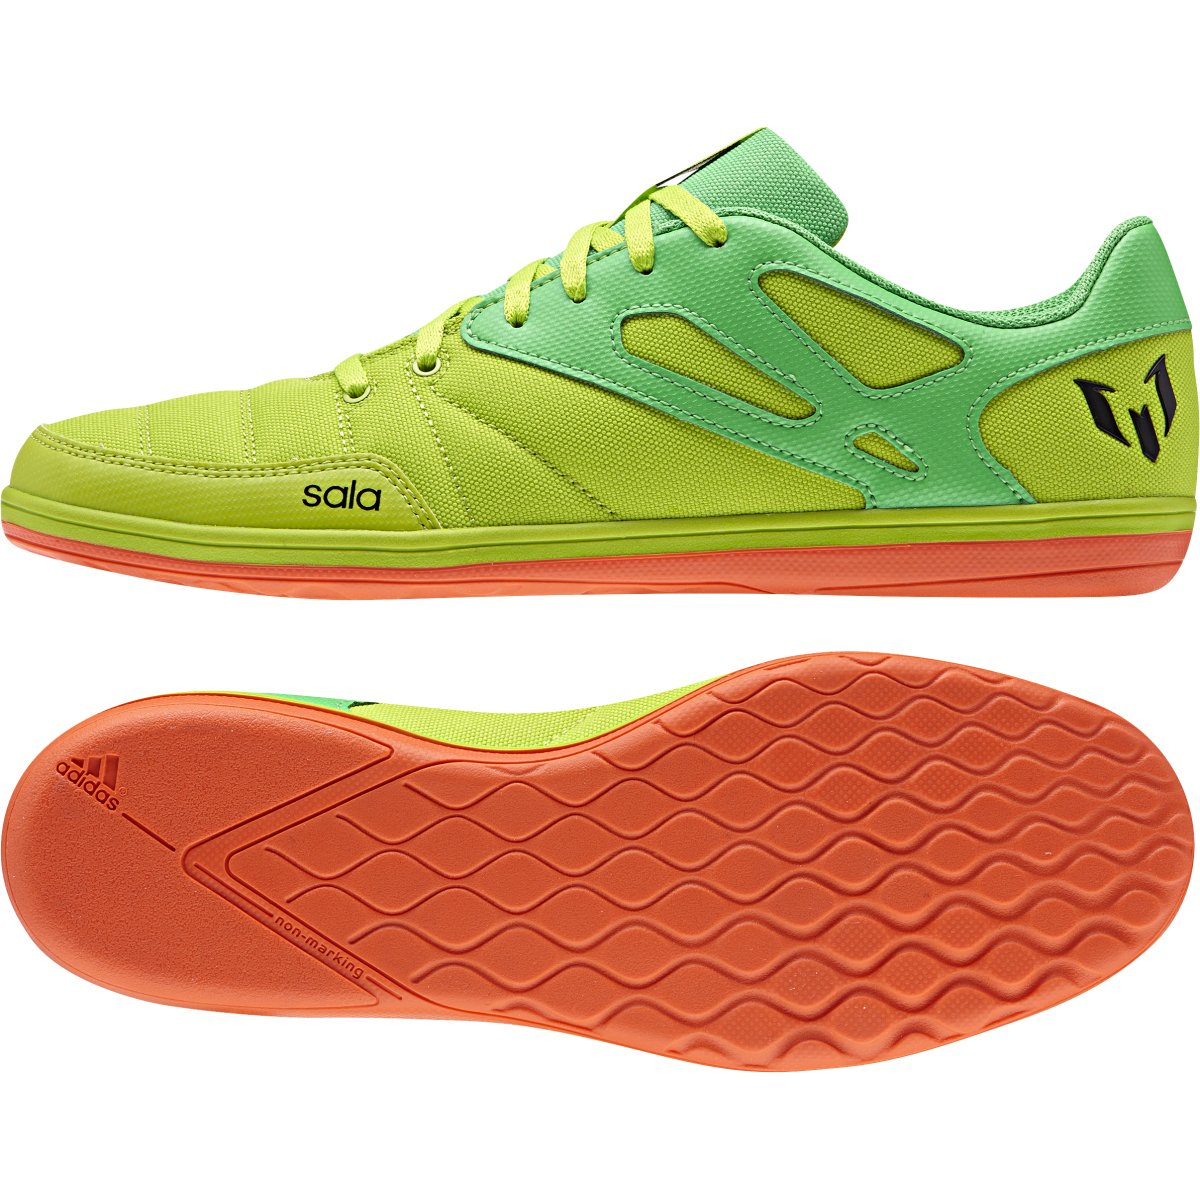 781ab851860c7 Chuteira Futsal Adidas Messi 15.4 ST Masculina - Compre Agora